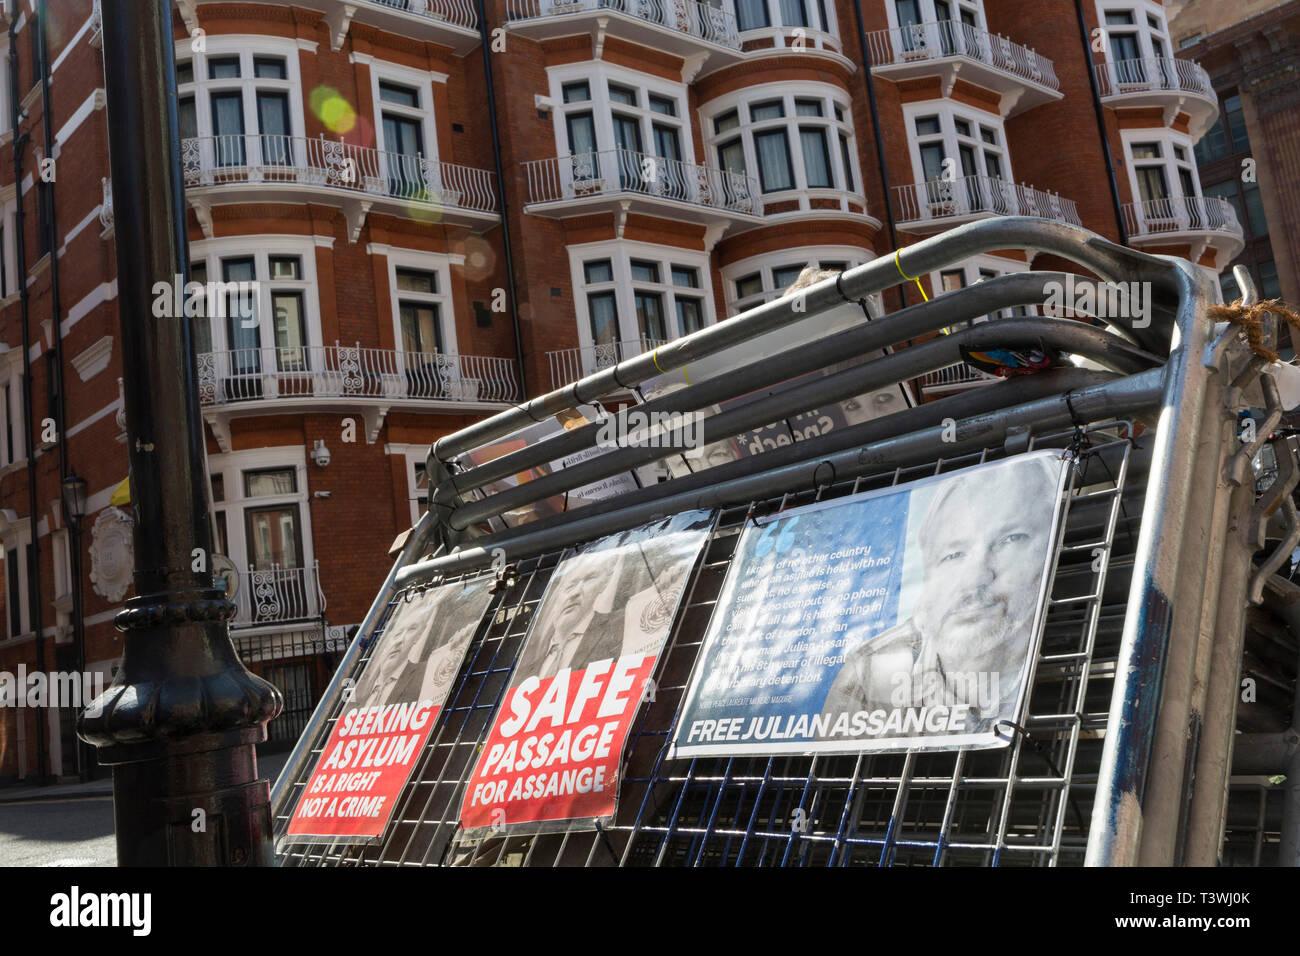 Assange Stock Photos Assange Stock Images Alamy